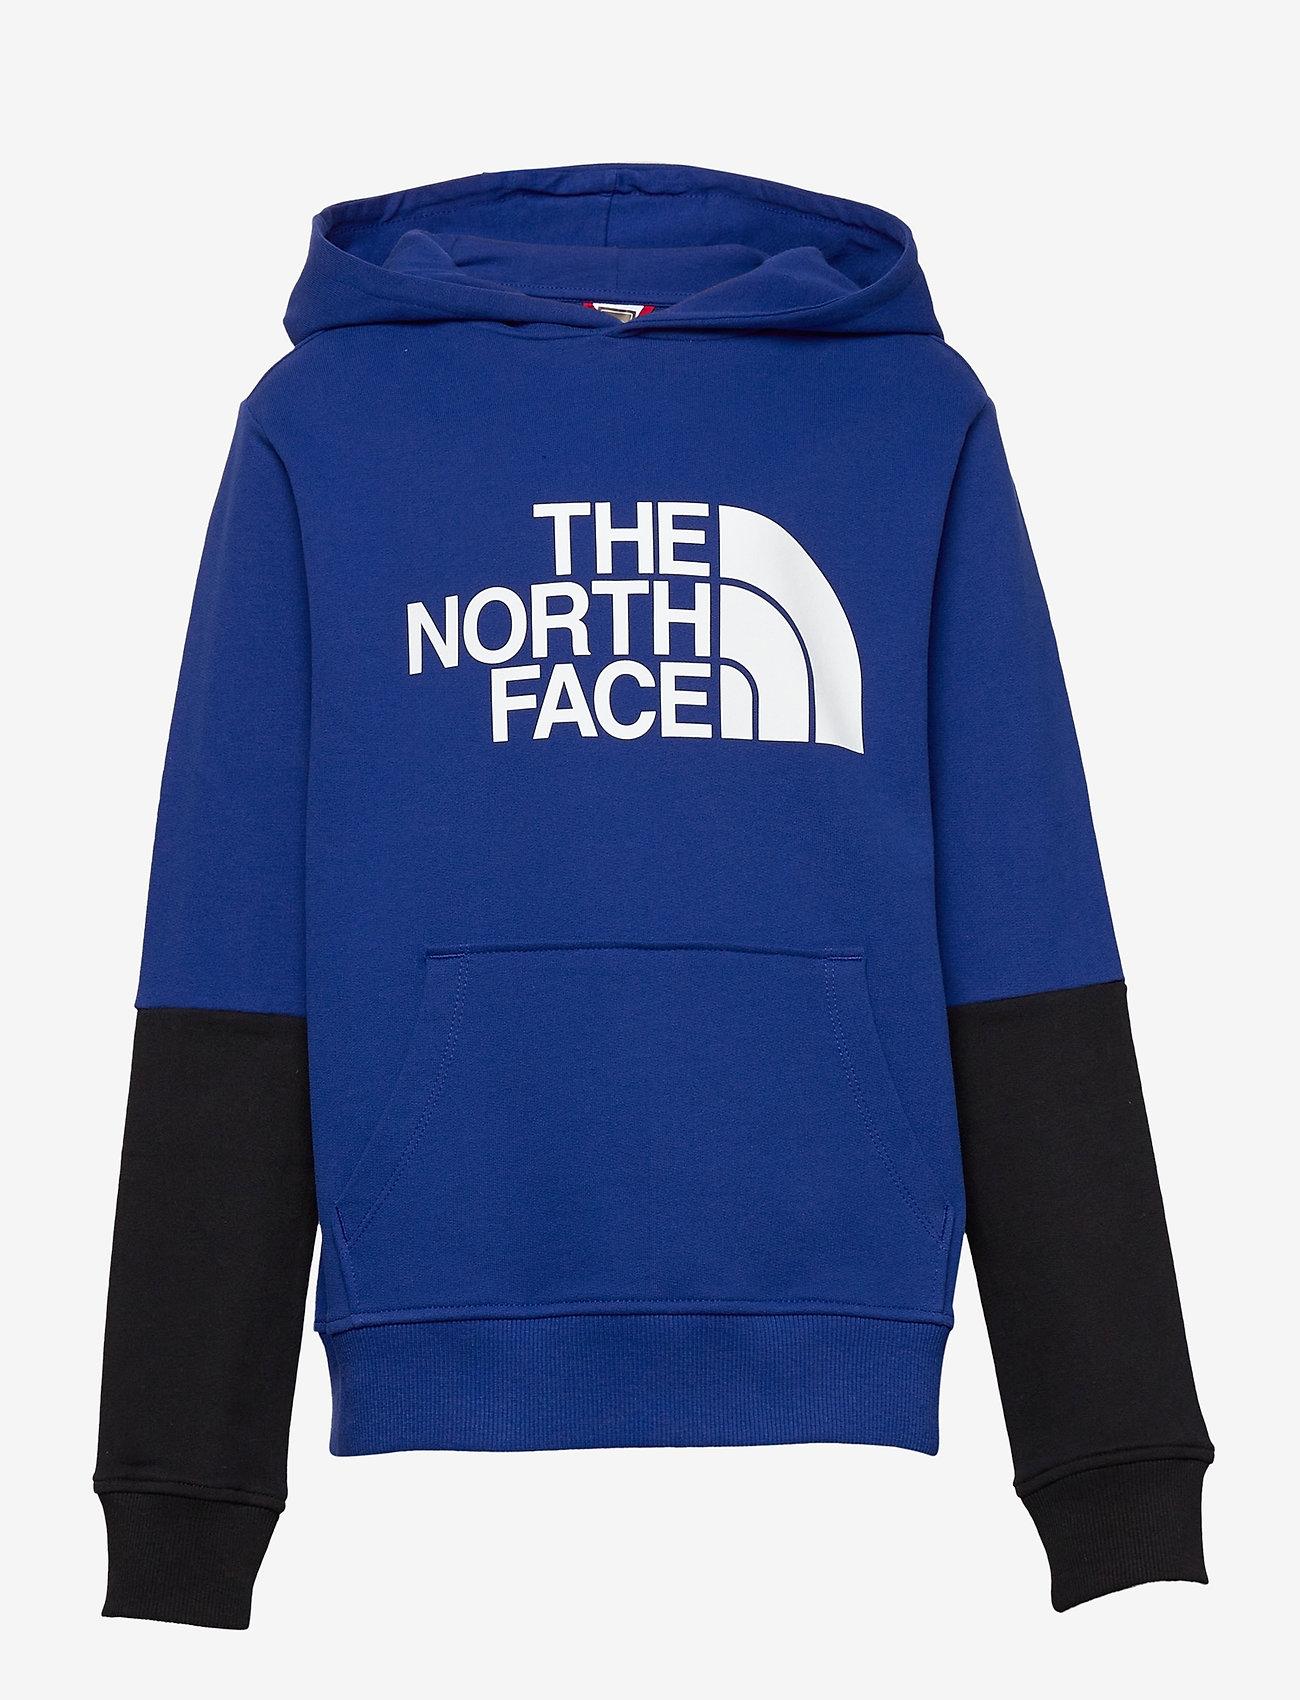 The North Face - Y DREW PEAK LIGHT P/O HOODIE - hoodies - bolt blue - 0